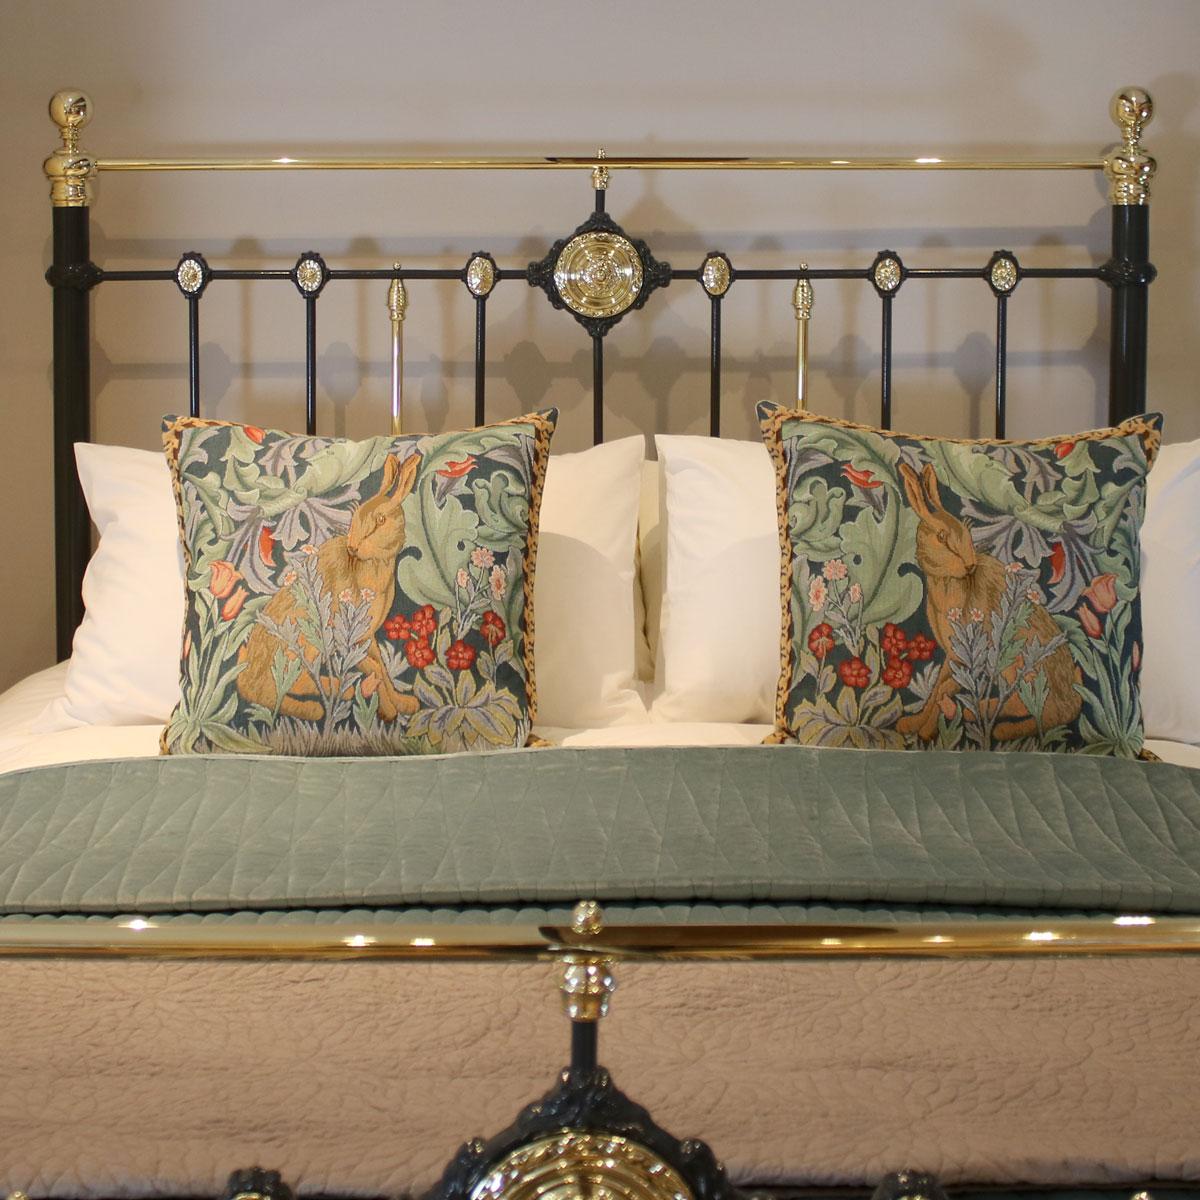 5ft-Dark-Grey-Brass-and-Iron-Straight-Bar-Antique-Bed-MK217